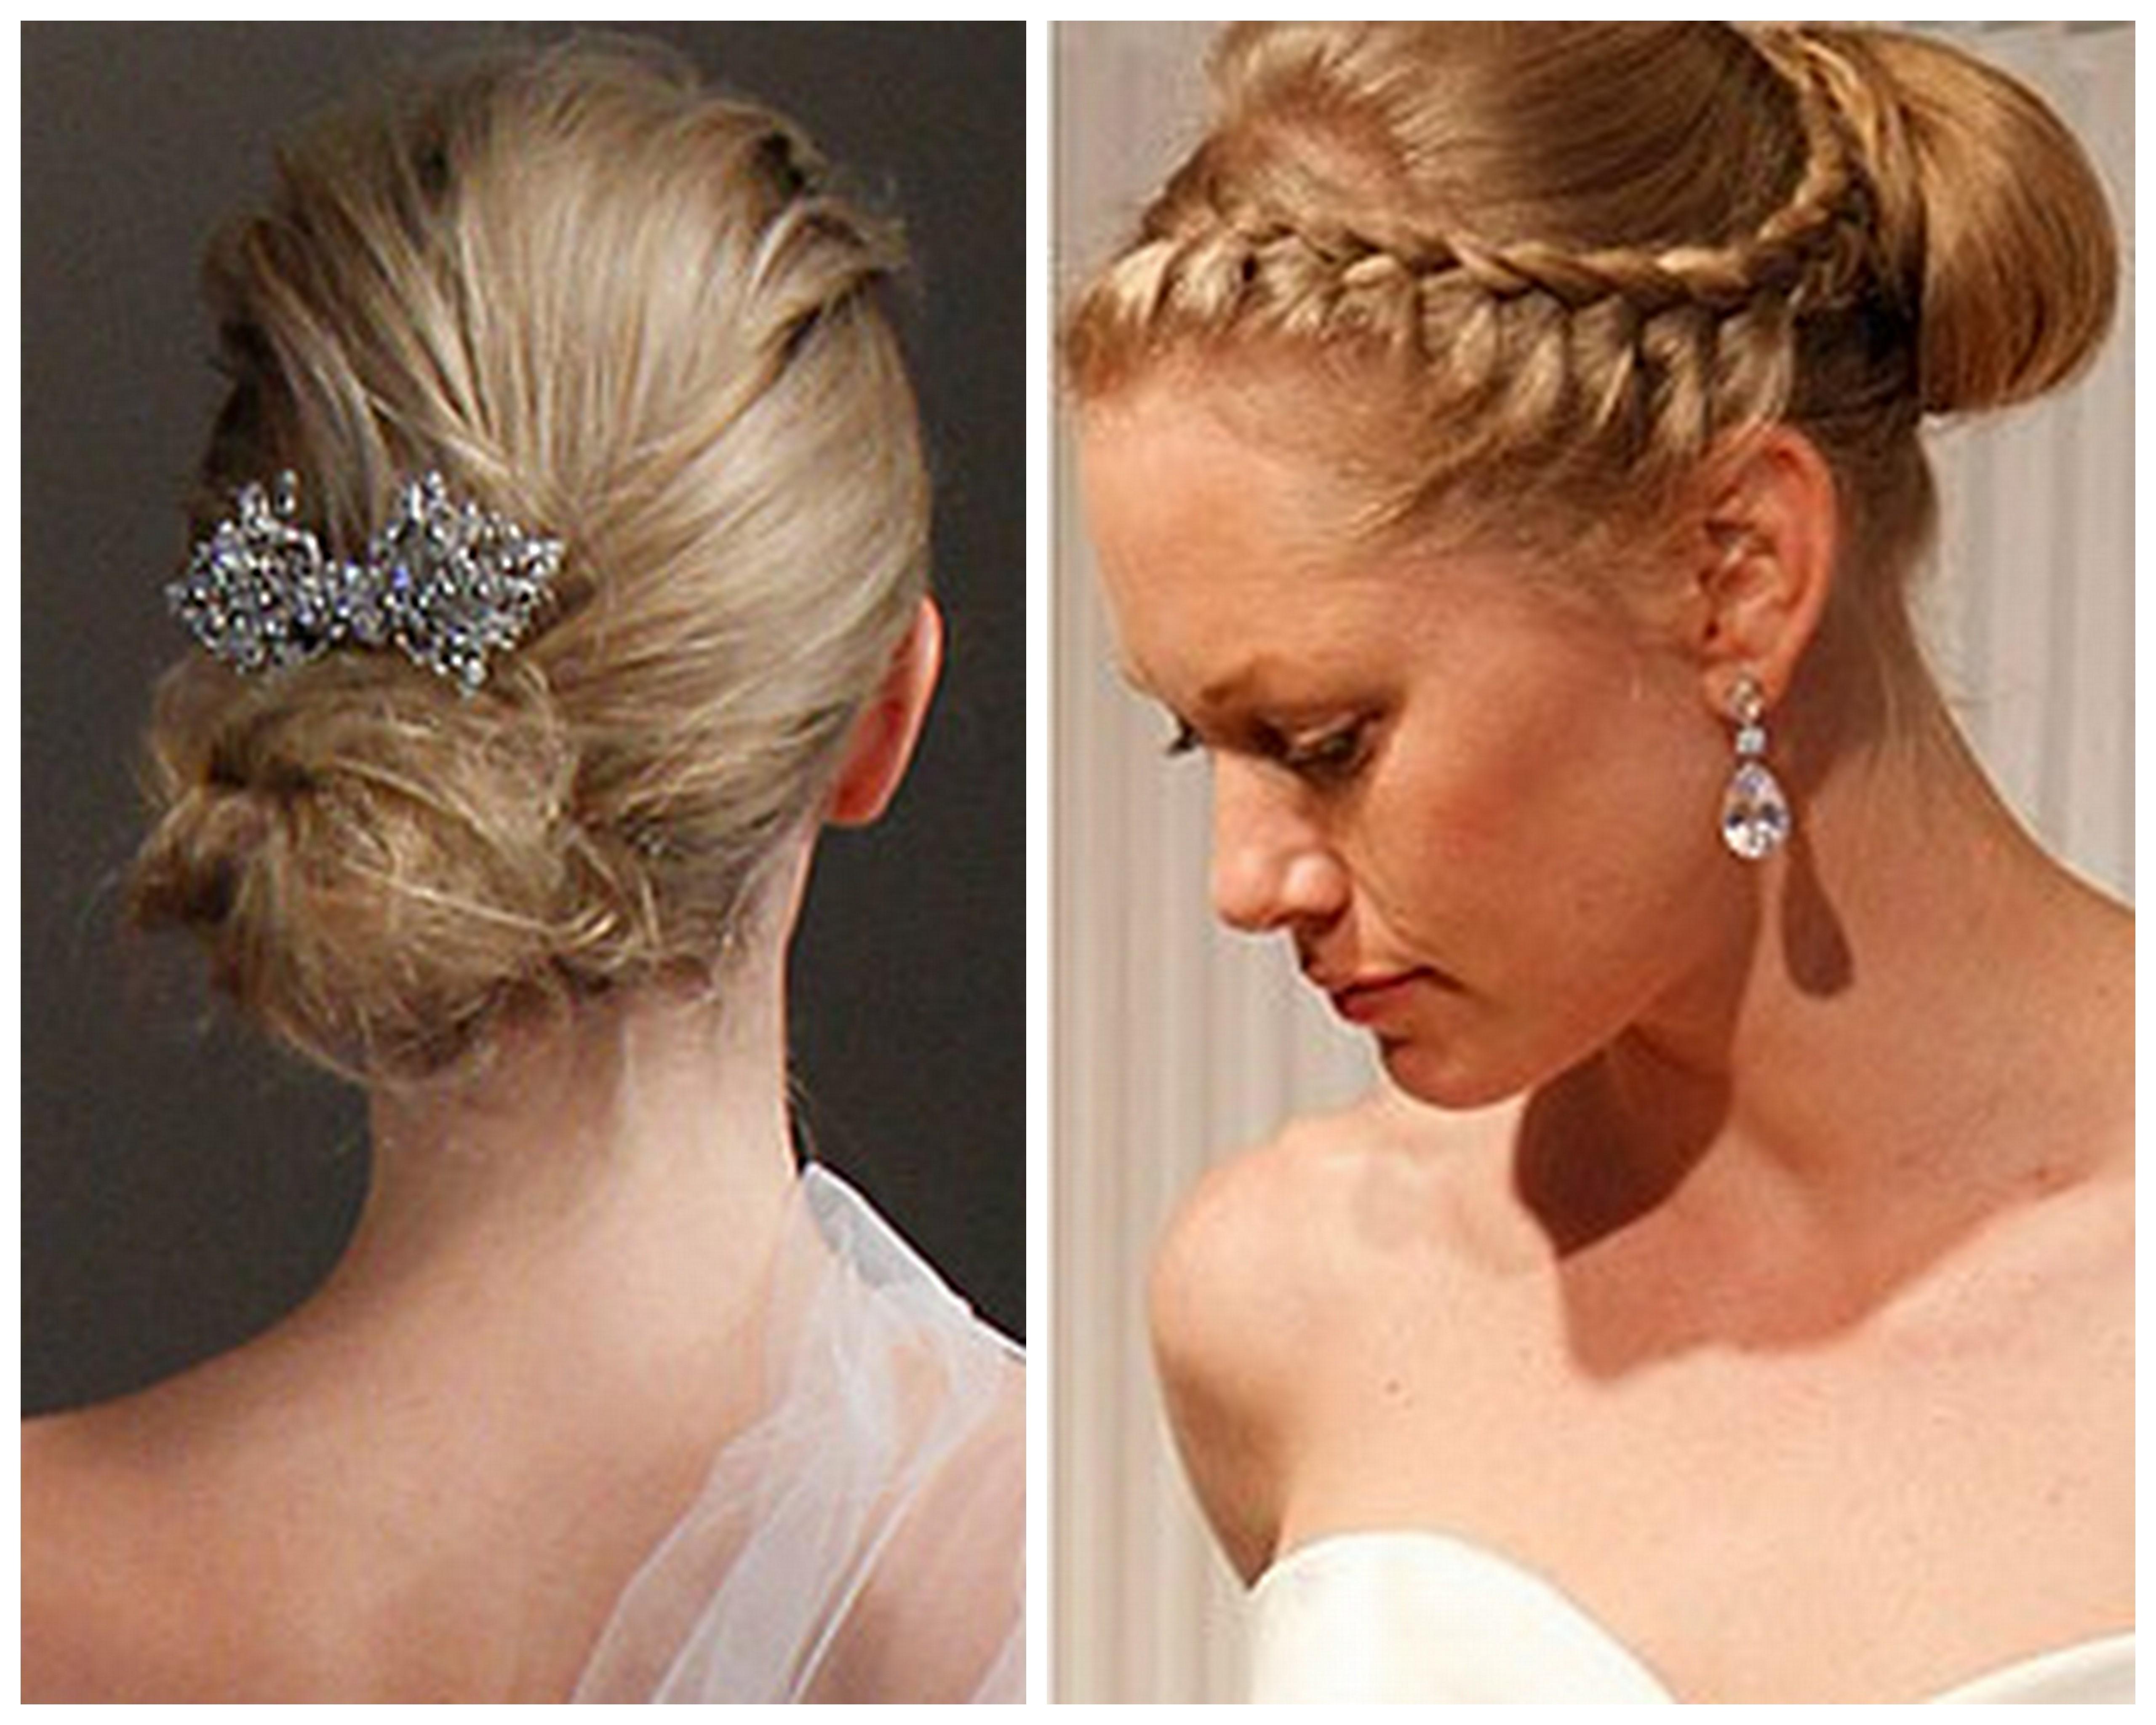 Transform Wedding Hairstyles For Medium Length Curly Hair On Wedding Within Popular Wedding Hairstyles For Medium Length Curly Hair (View 11 of 15)